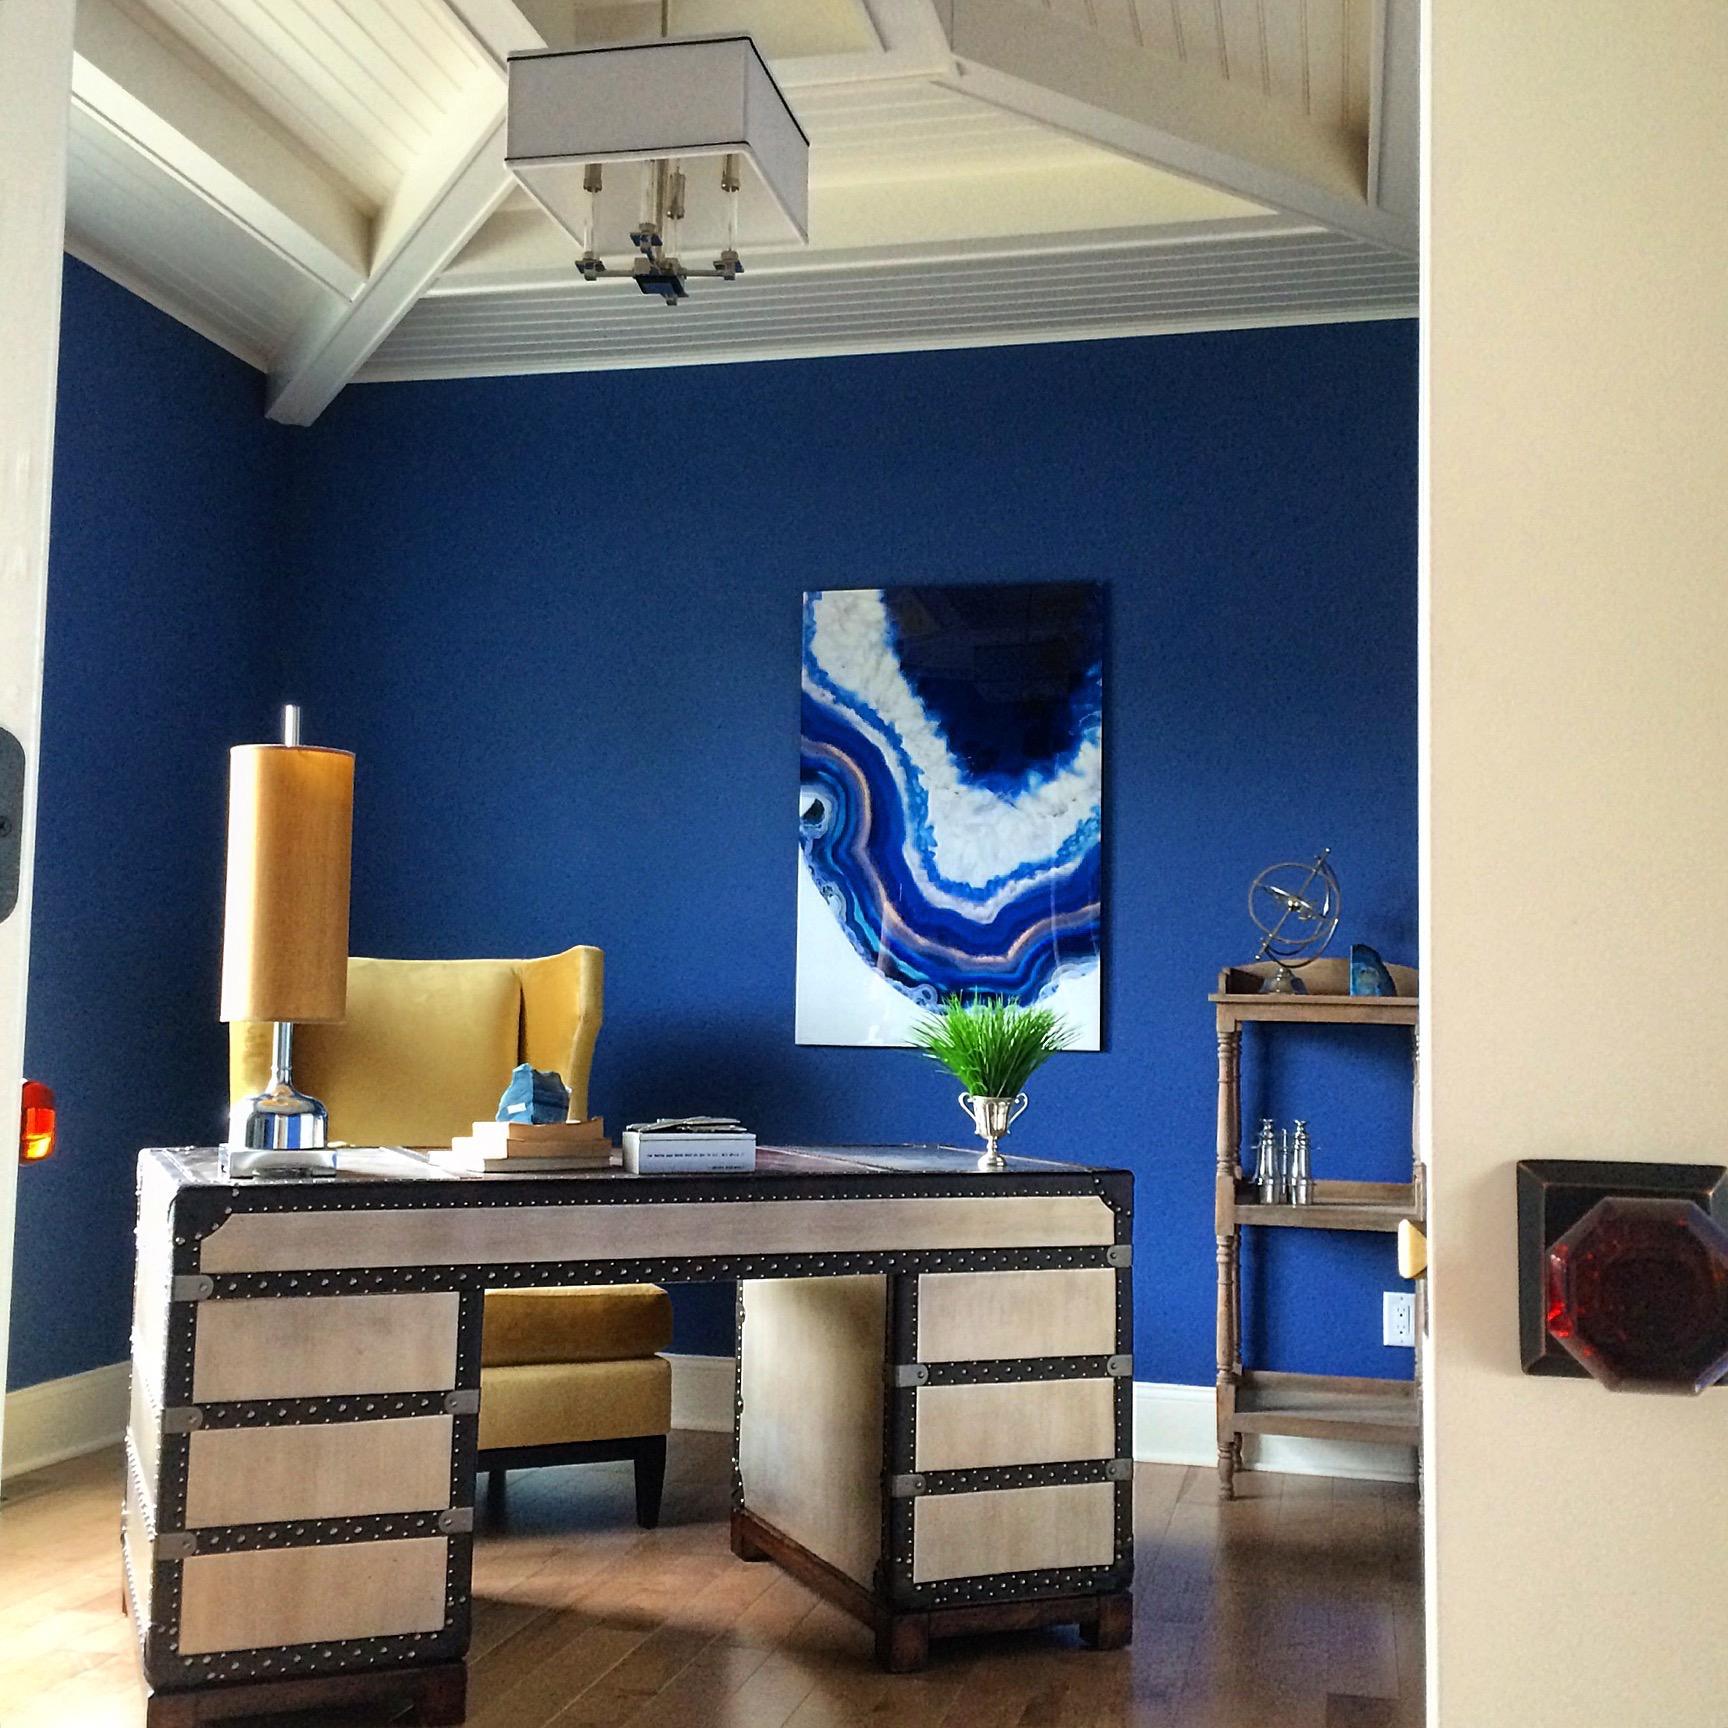 agate-art-home-office-wall-decor-navy-sherwin-williams-indigo-batik-7602